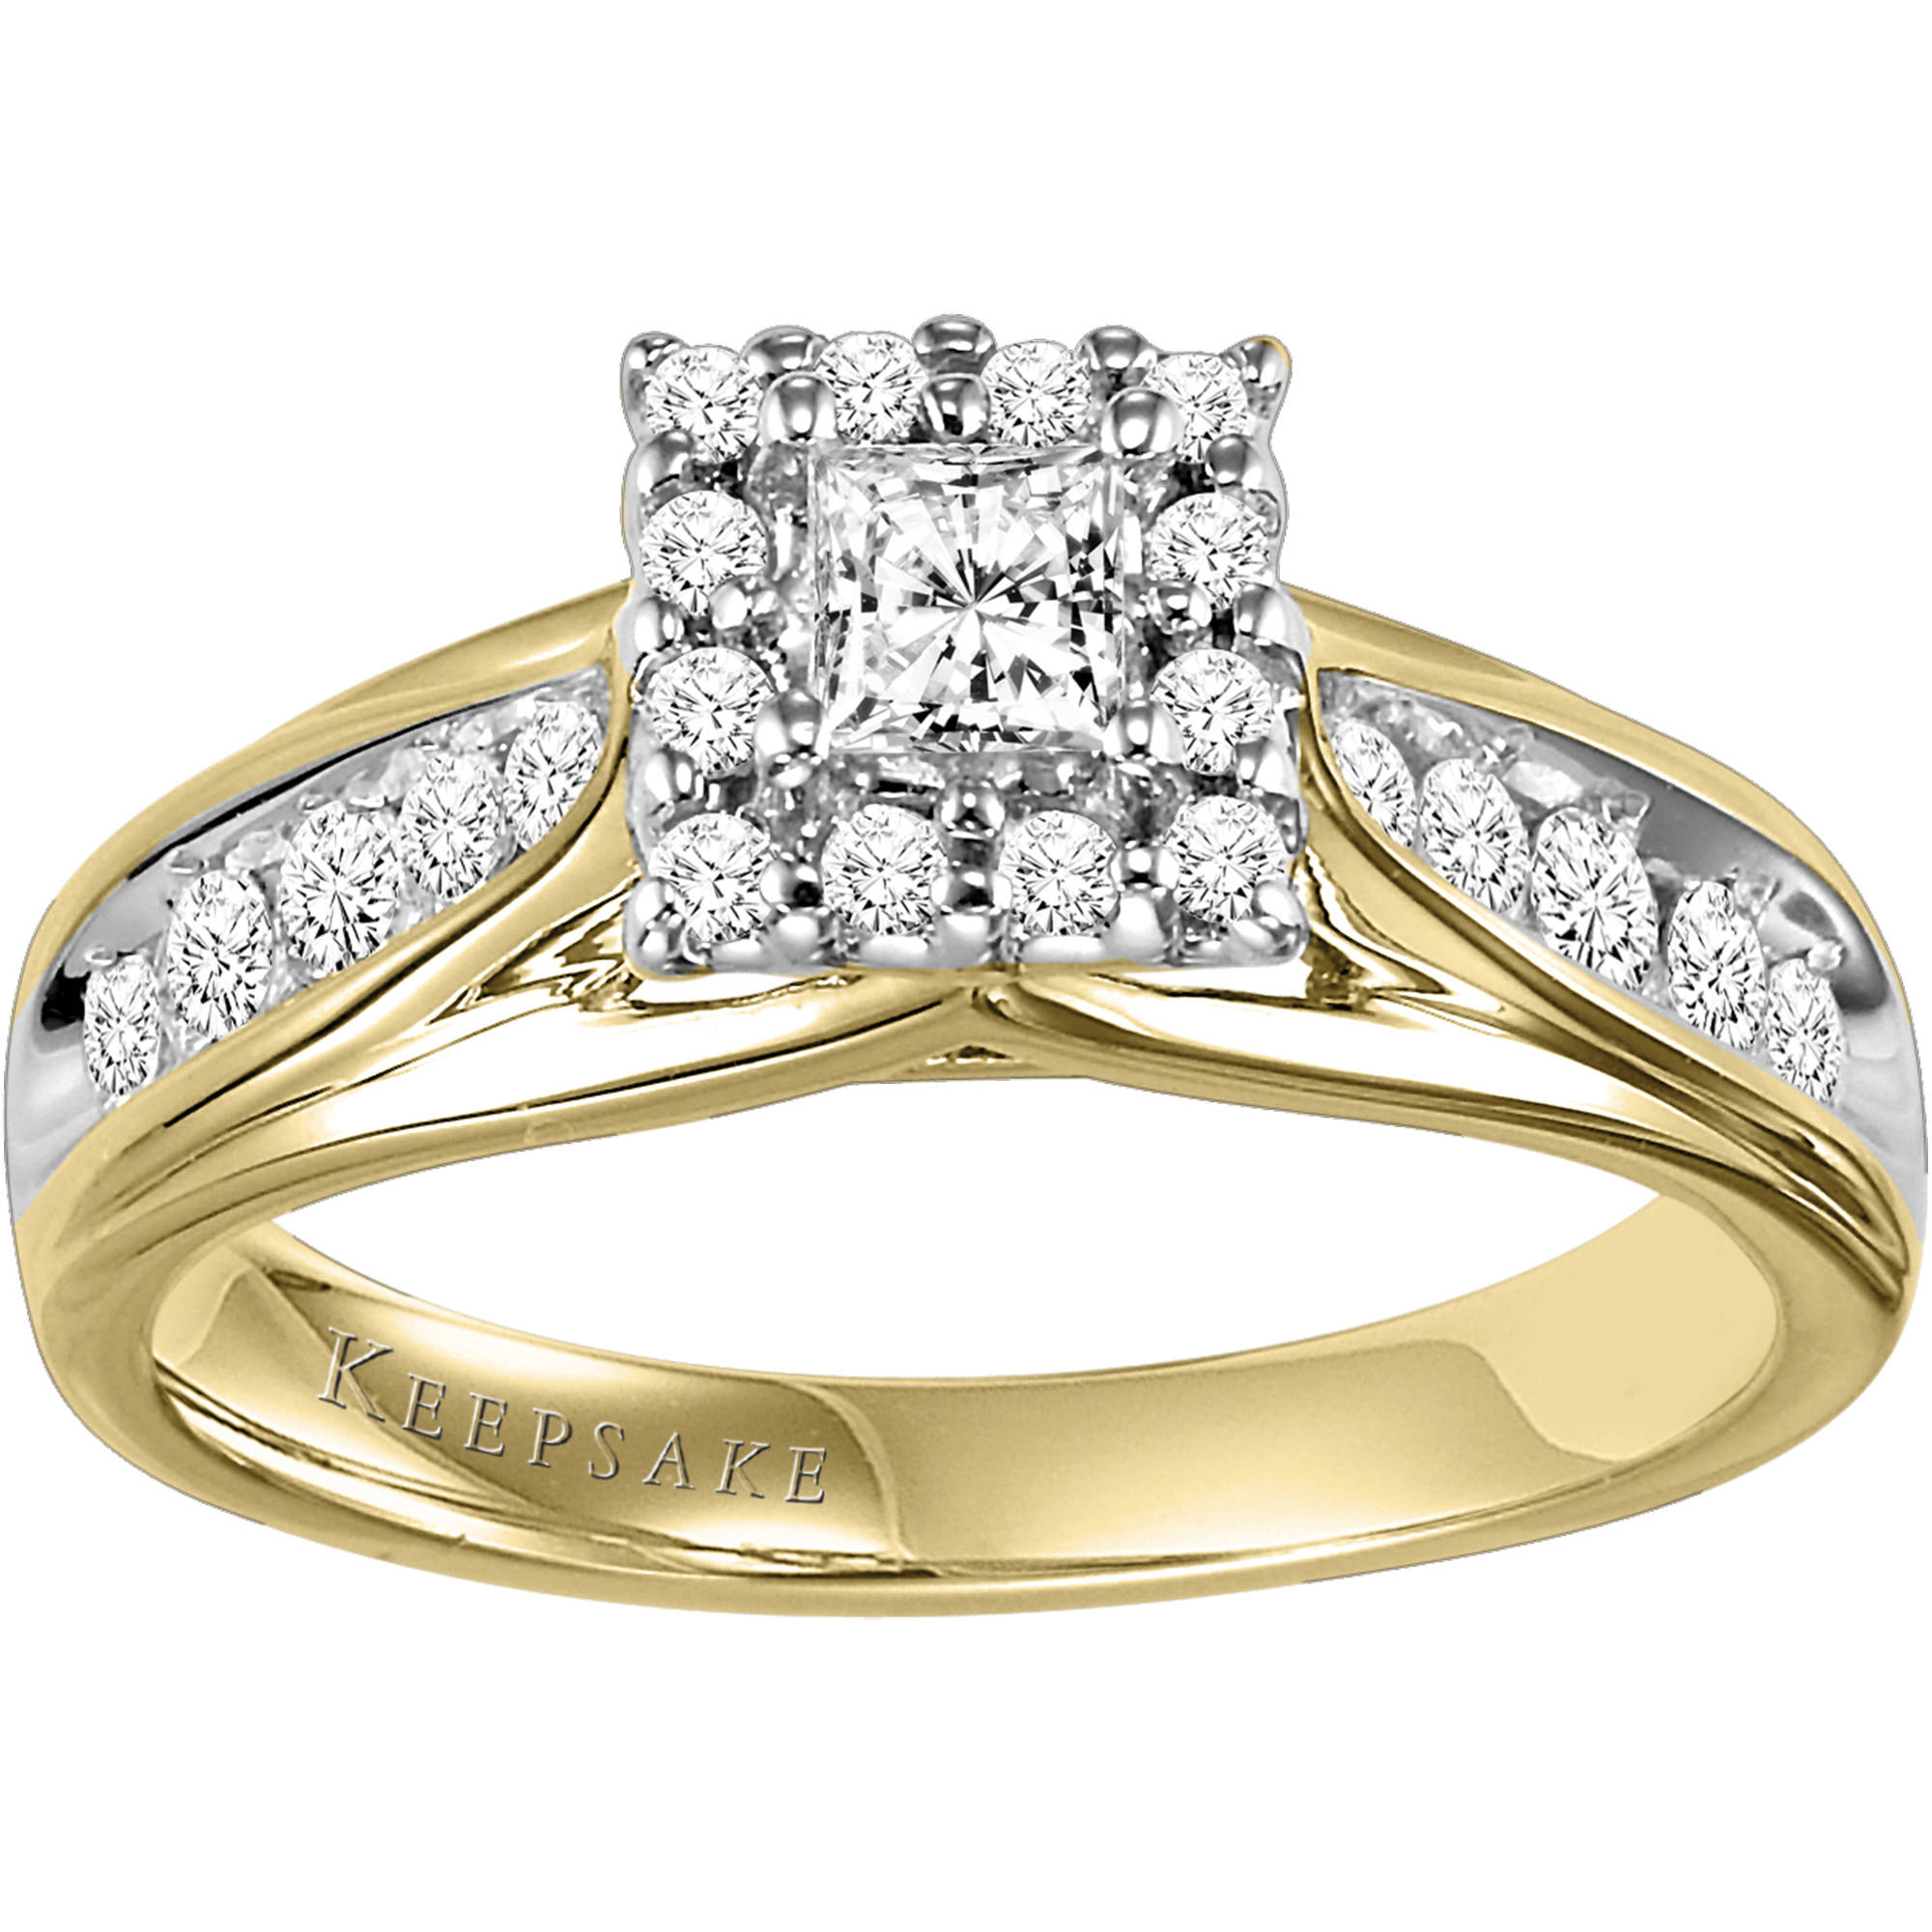 Keepsake Melody 1/2 Carat T.W. Diamond 10kt Yellow Gold Engagement Ring